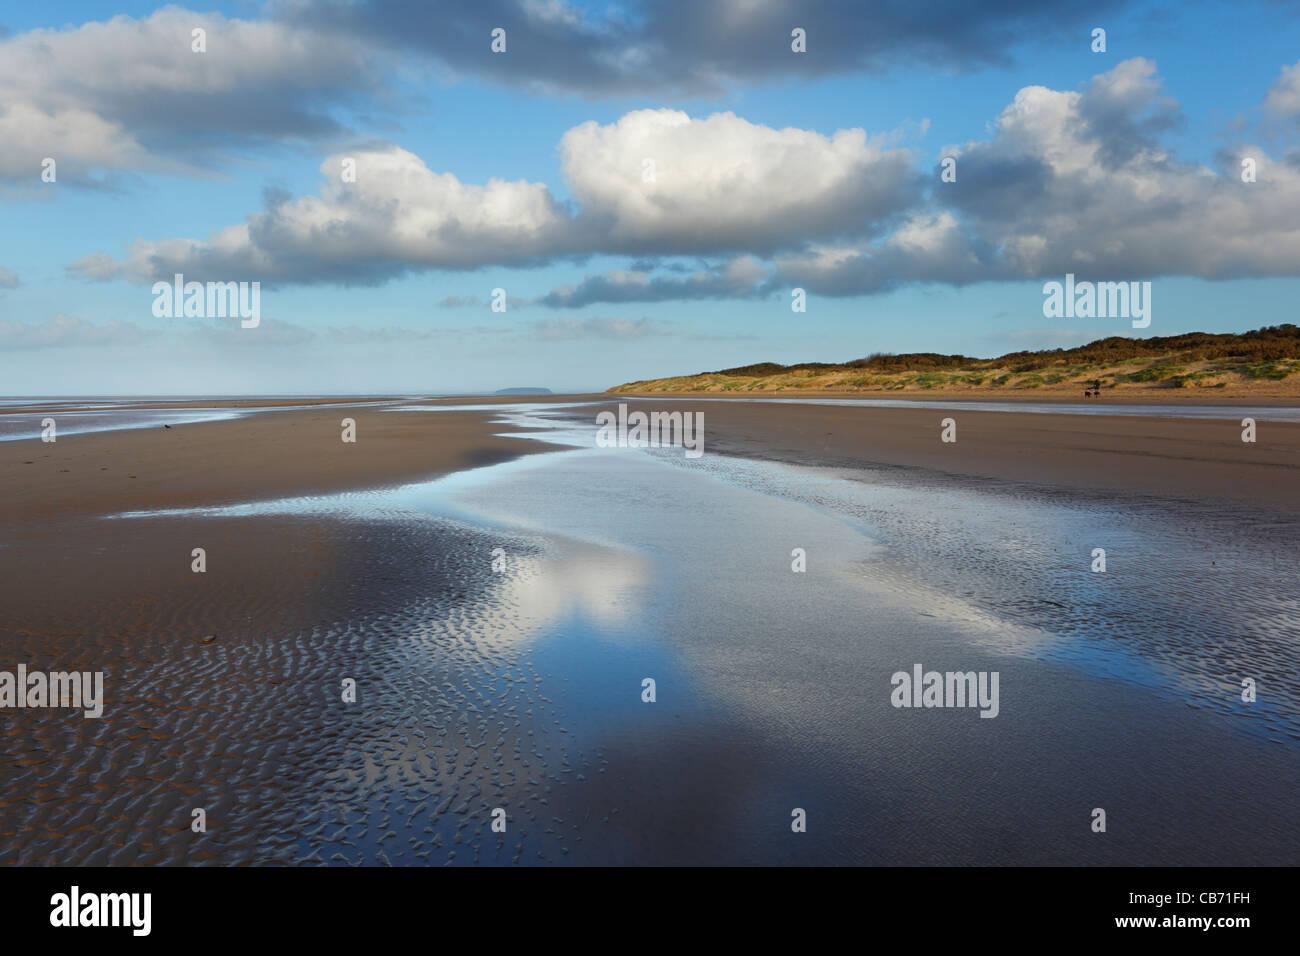 Burnham Beach with Steep Holm Island in the Distance. Burnham-on-Sea. Somerset. England. UK. - Stock Image